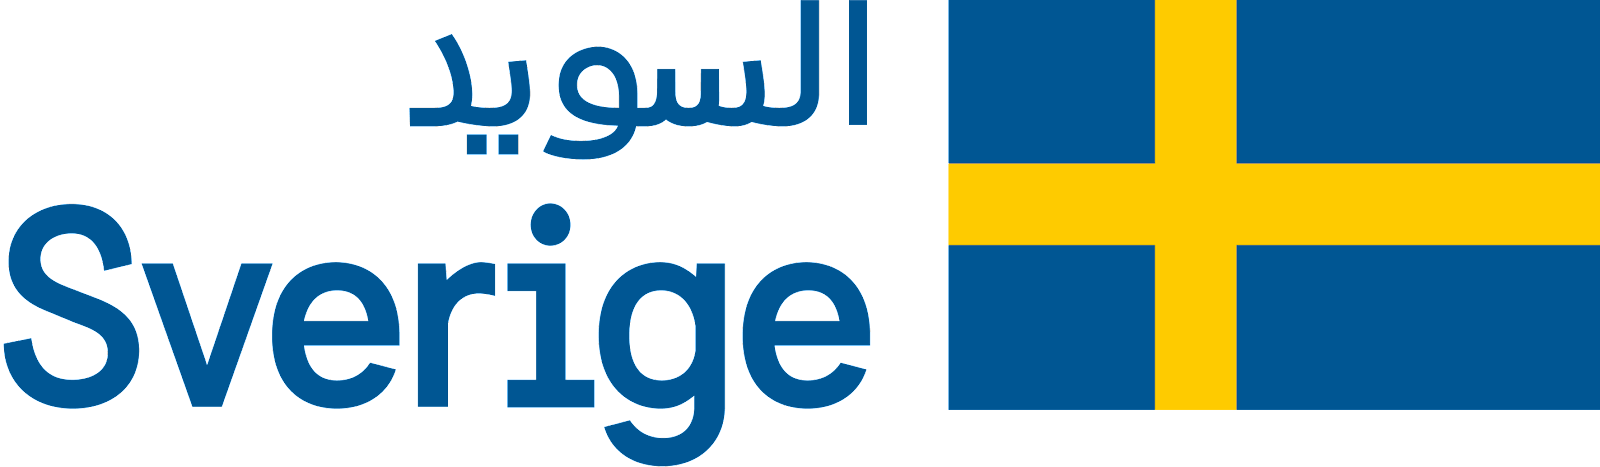 PS Shebokshy |  أخبار ومعلومات عن السويد بالعربية وعالمية يومية